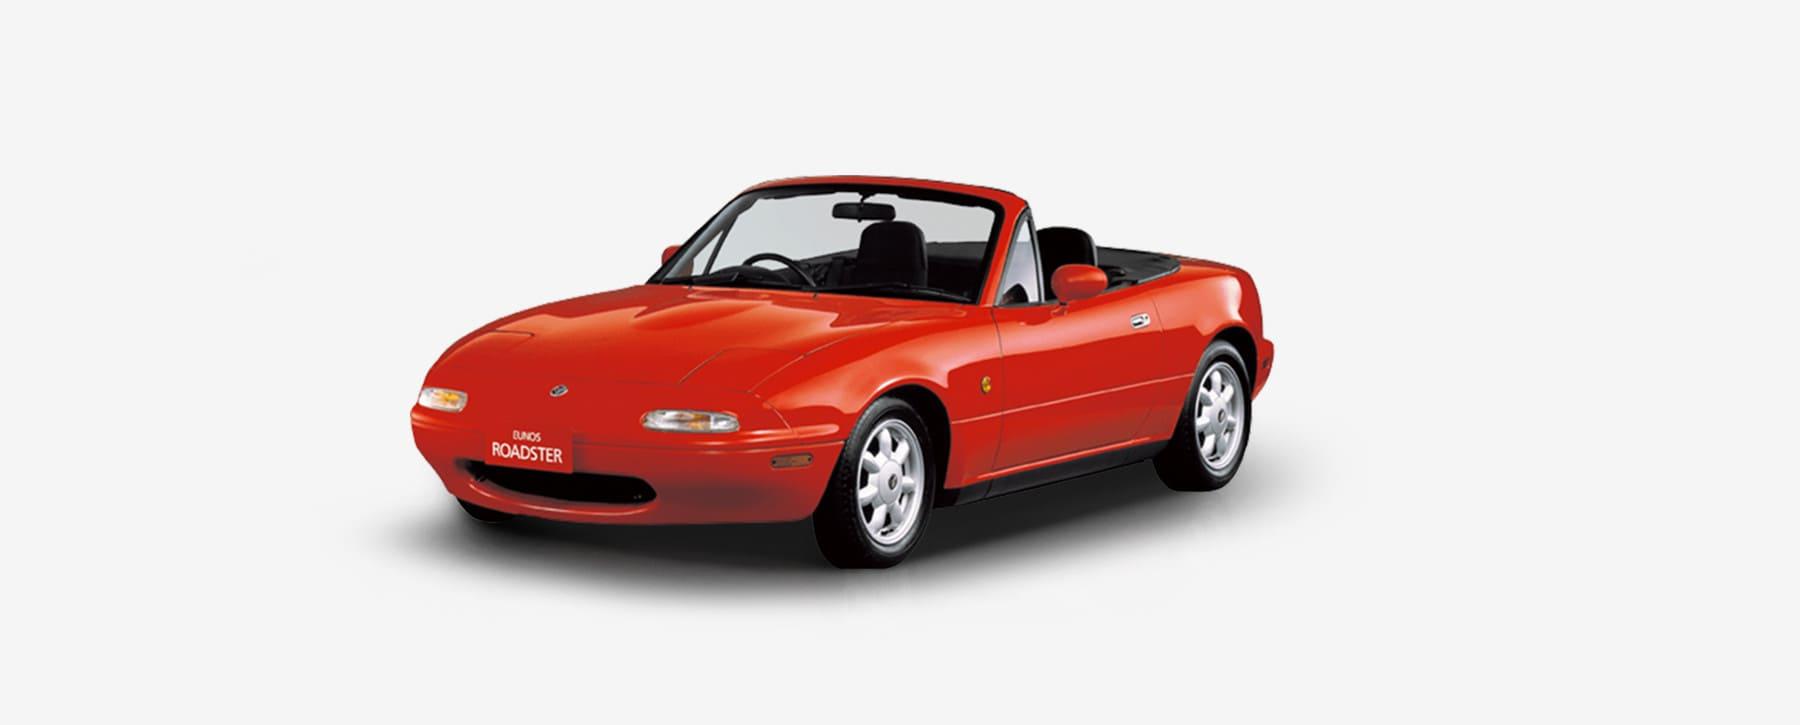 Historia de Mazda – El primer Miata 1989